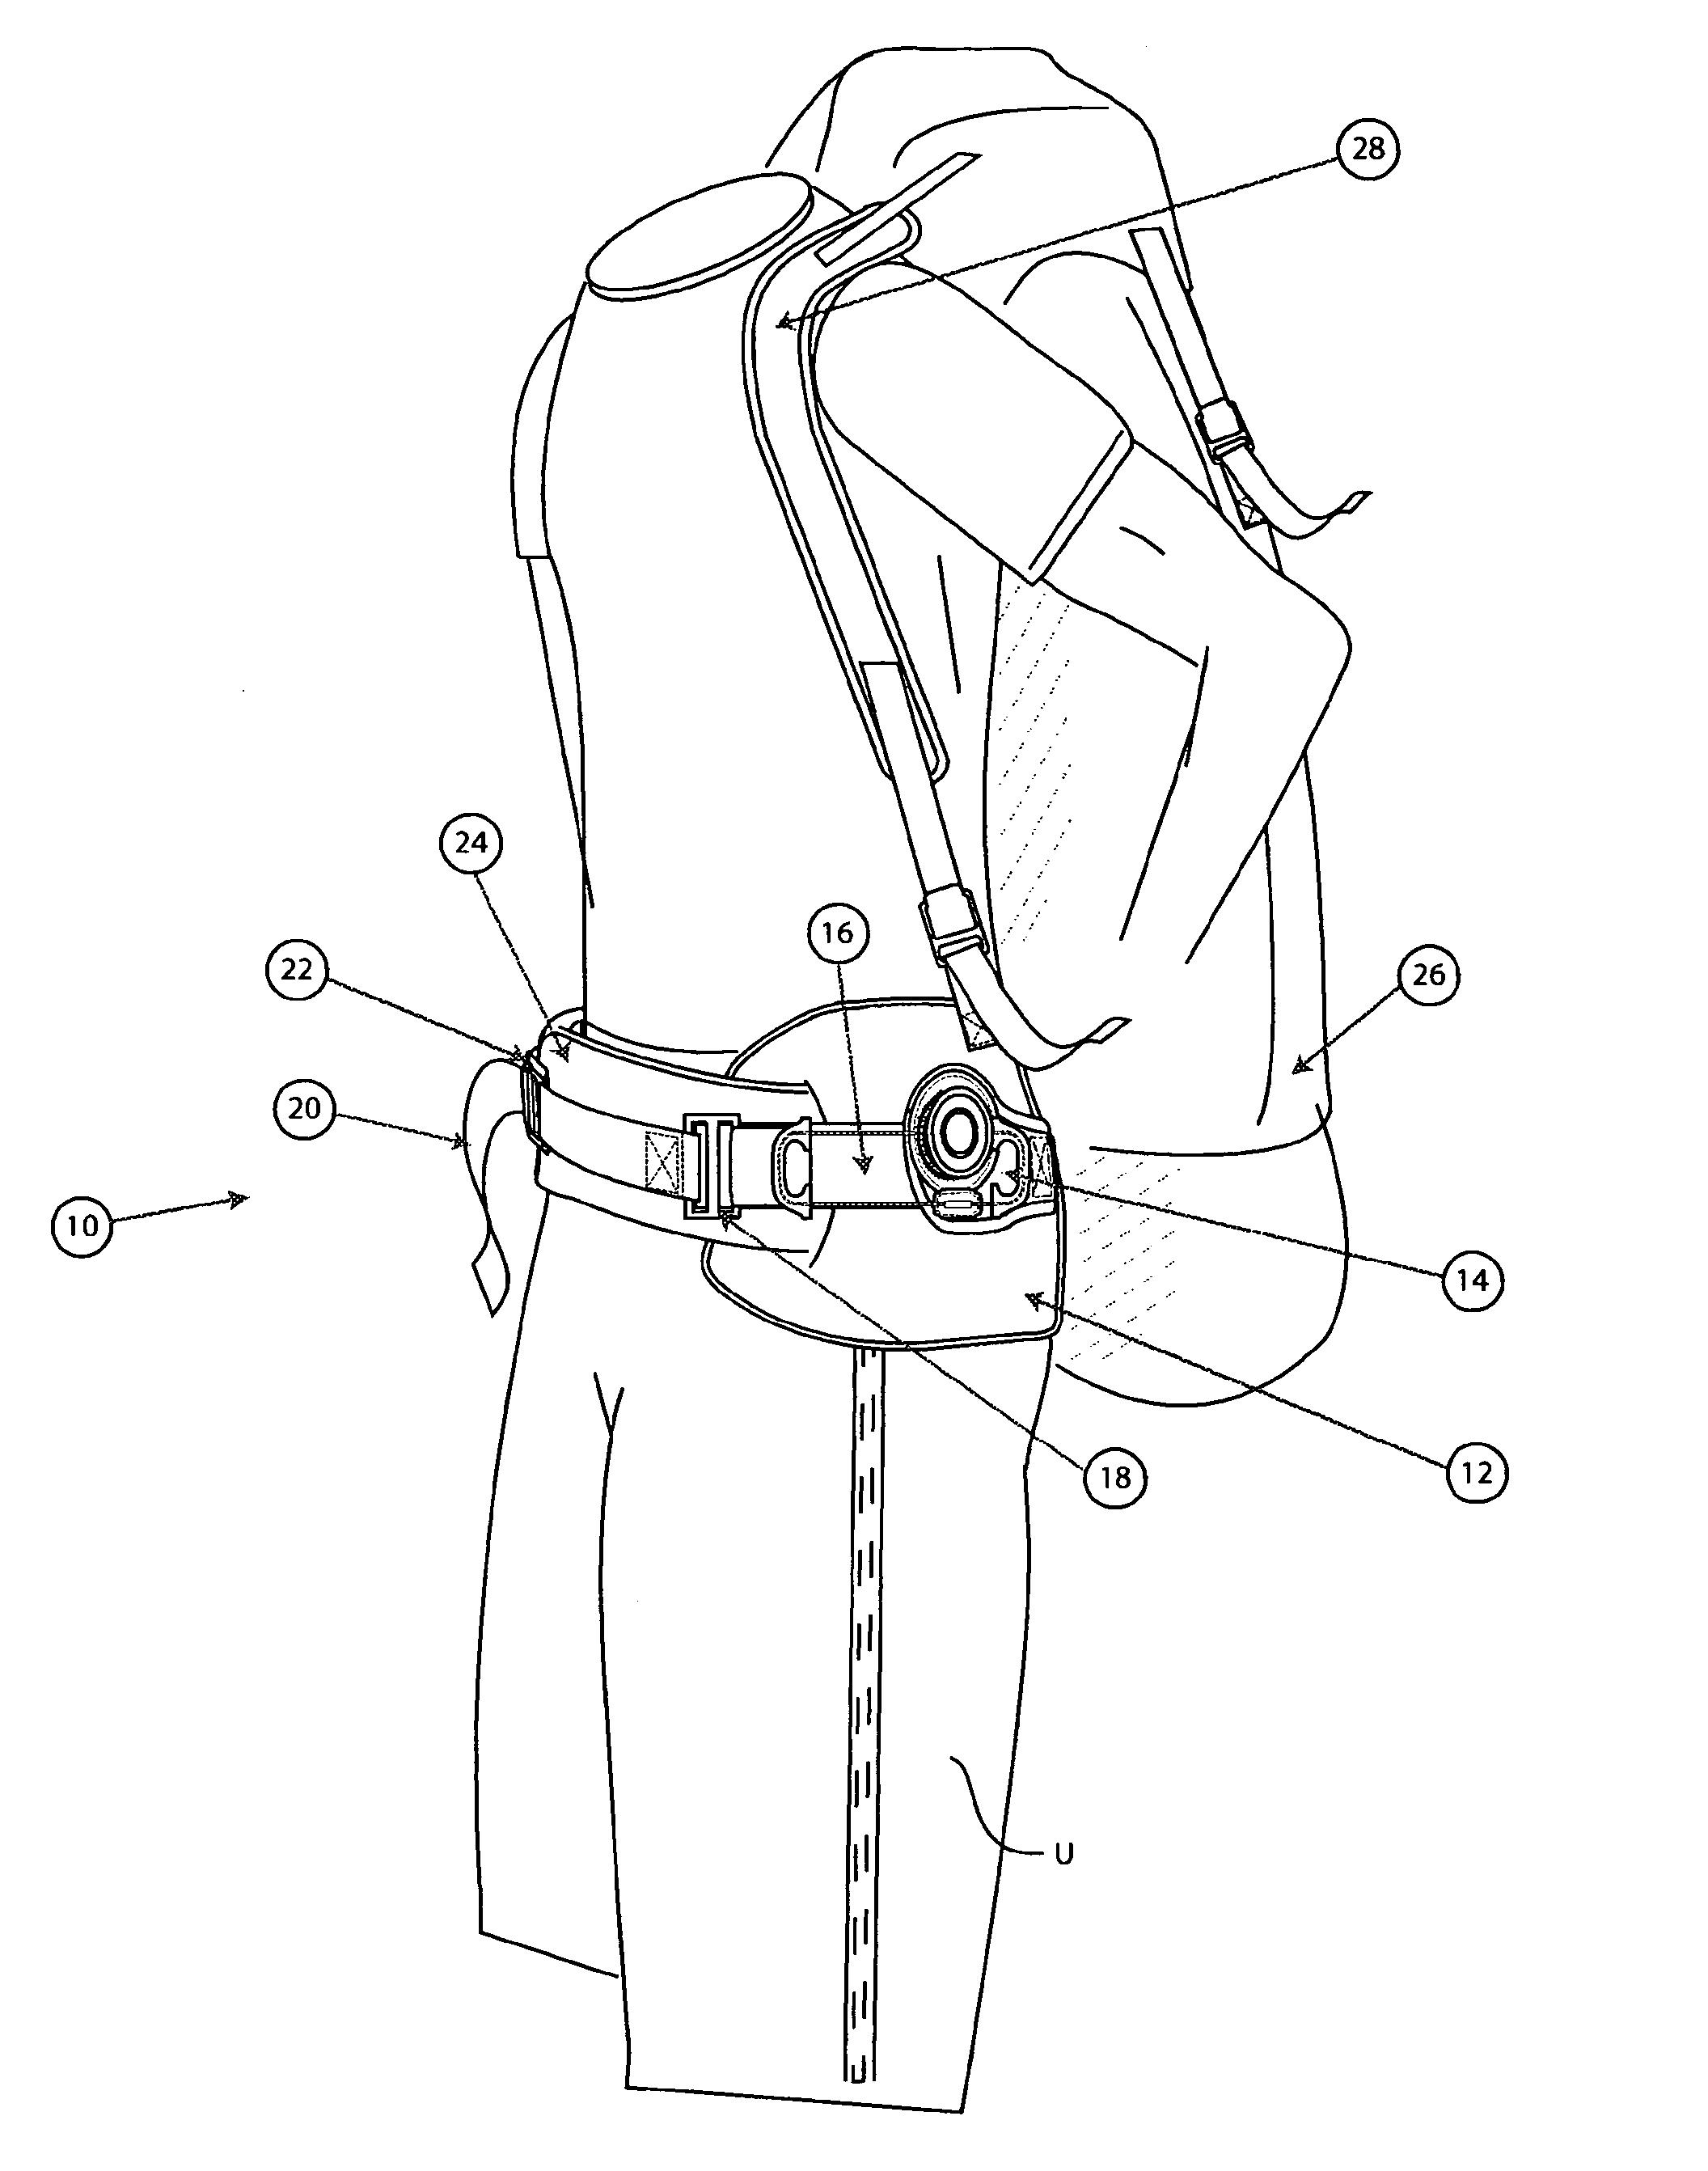 patent us7600660 - harness tightening system